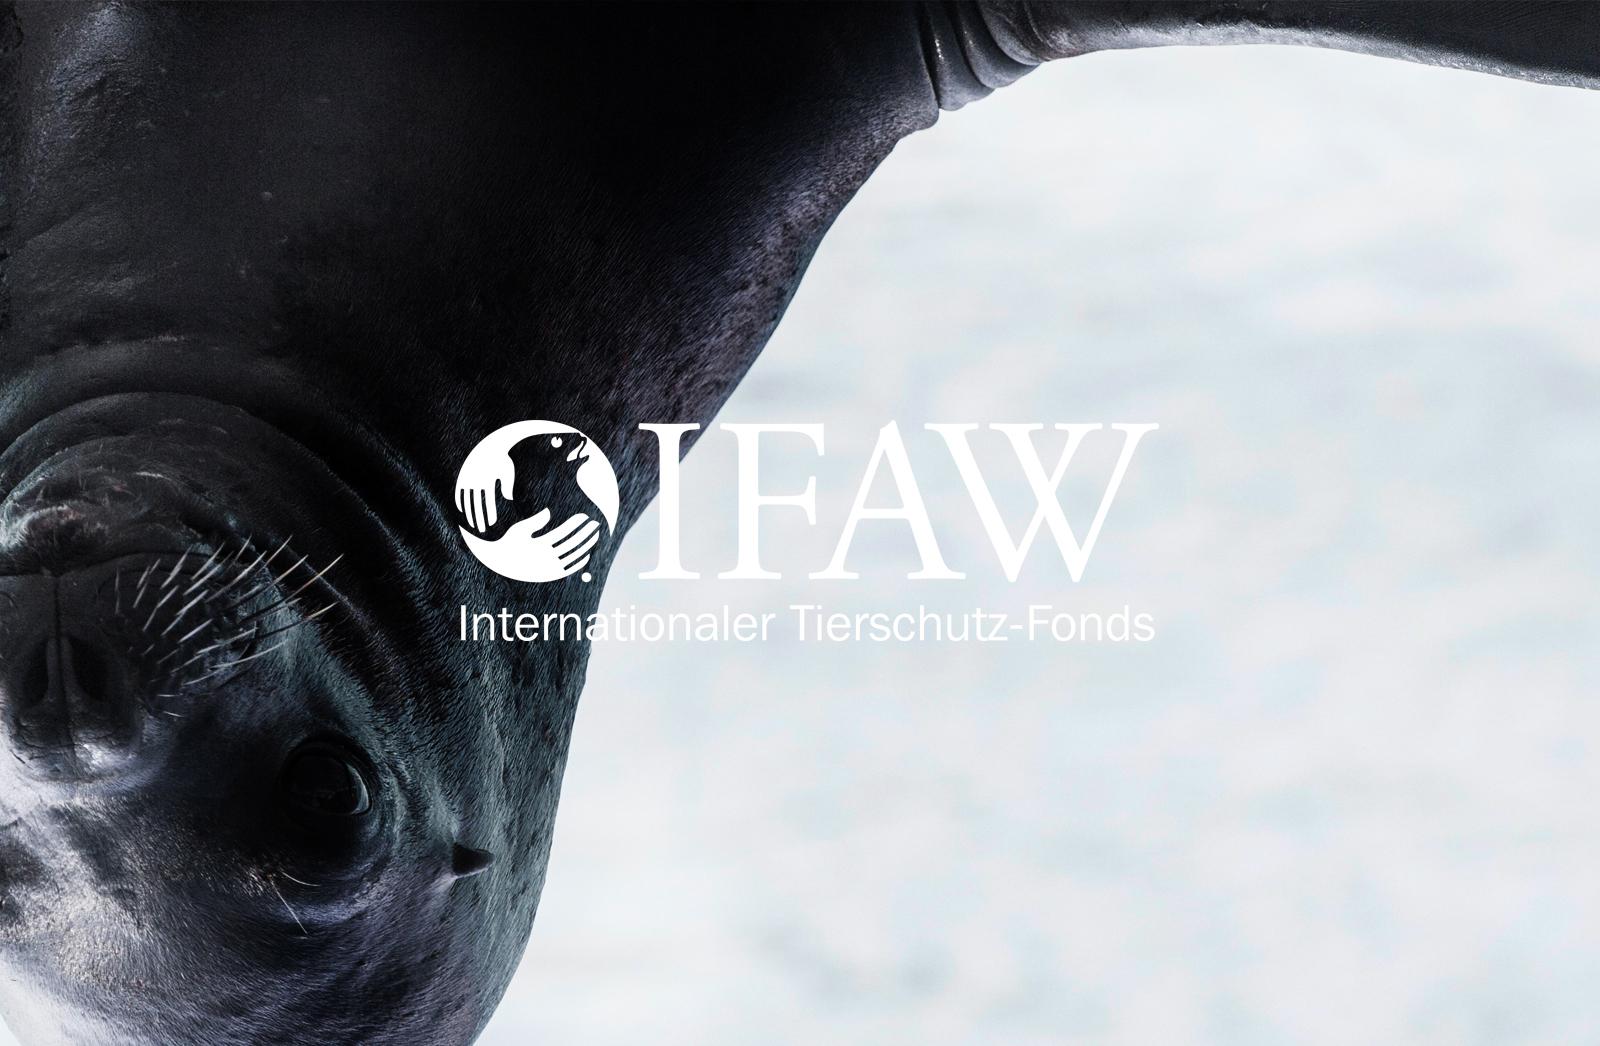 IFAW_1 Kopie